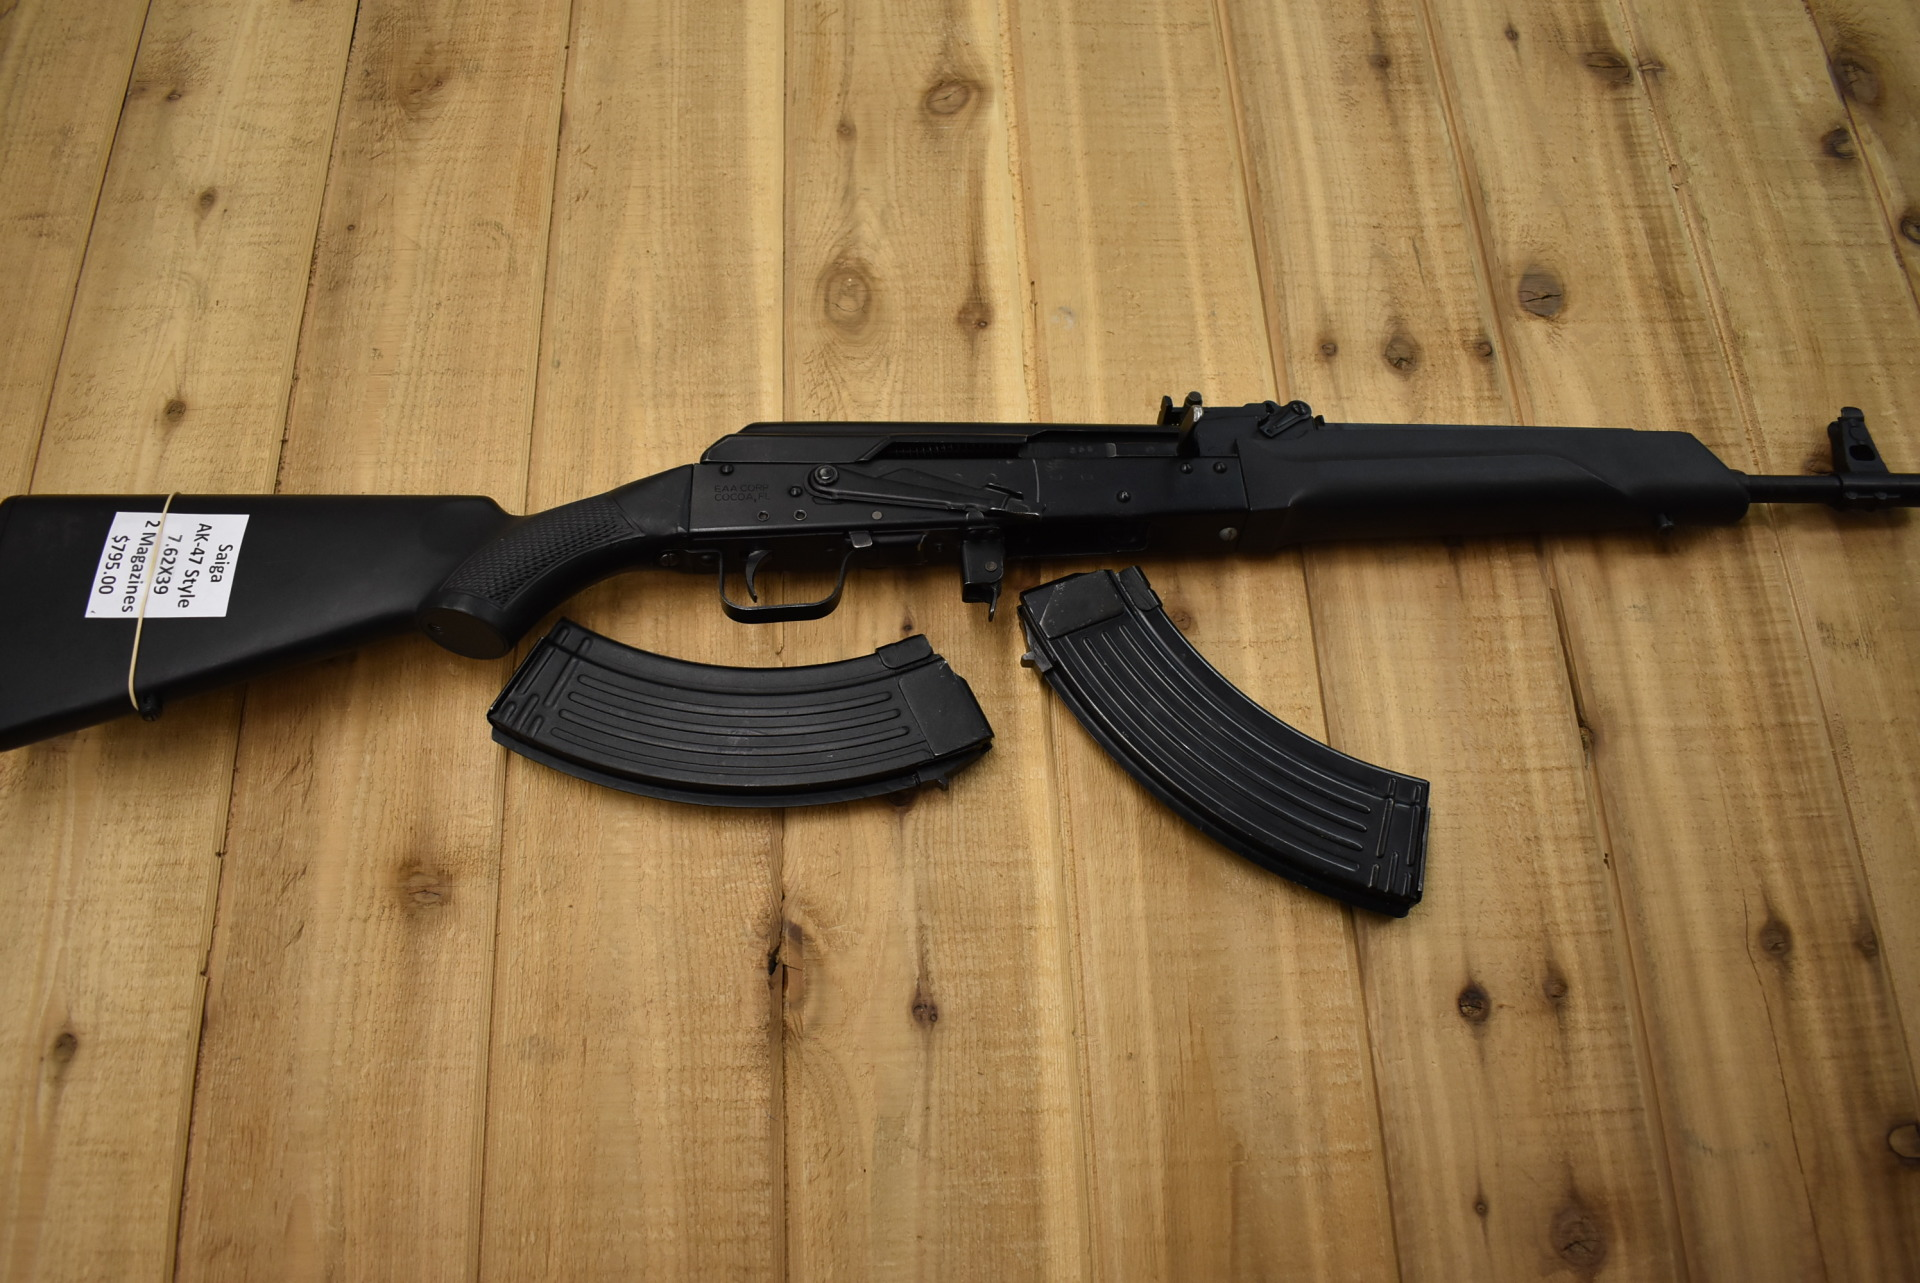 Saiga AK-47 Style